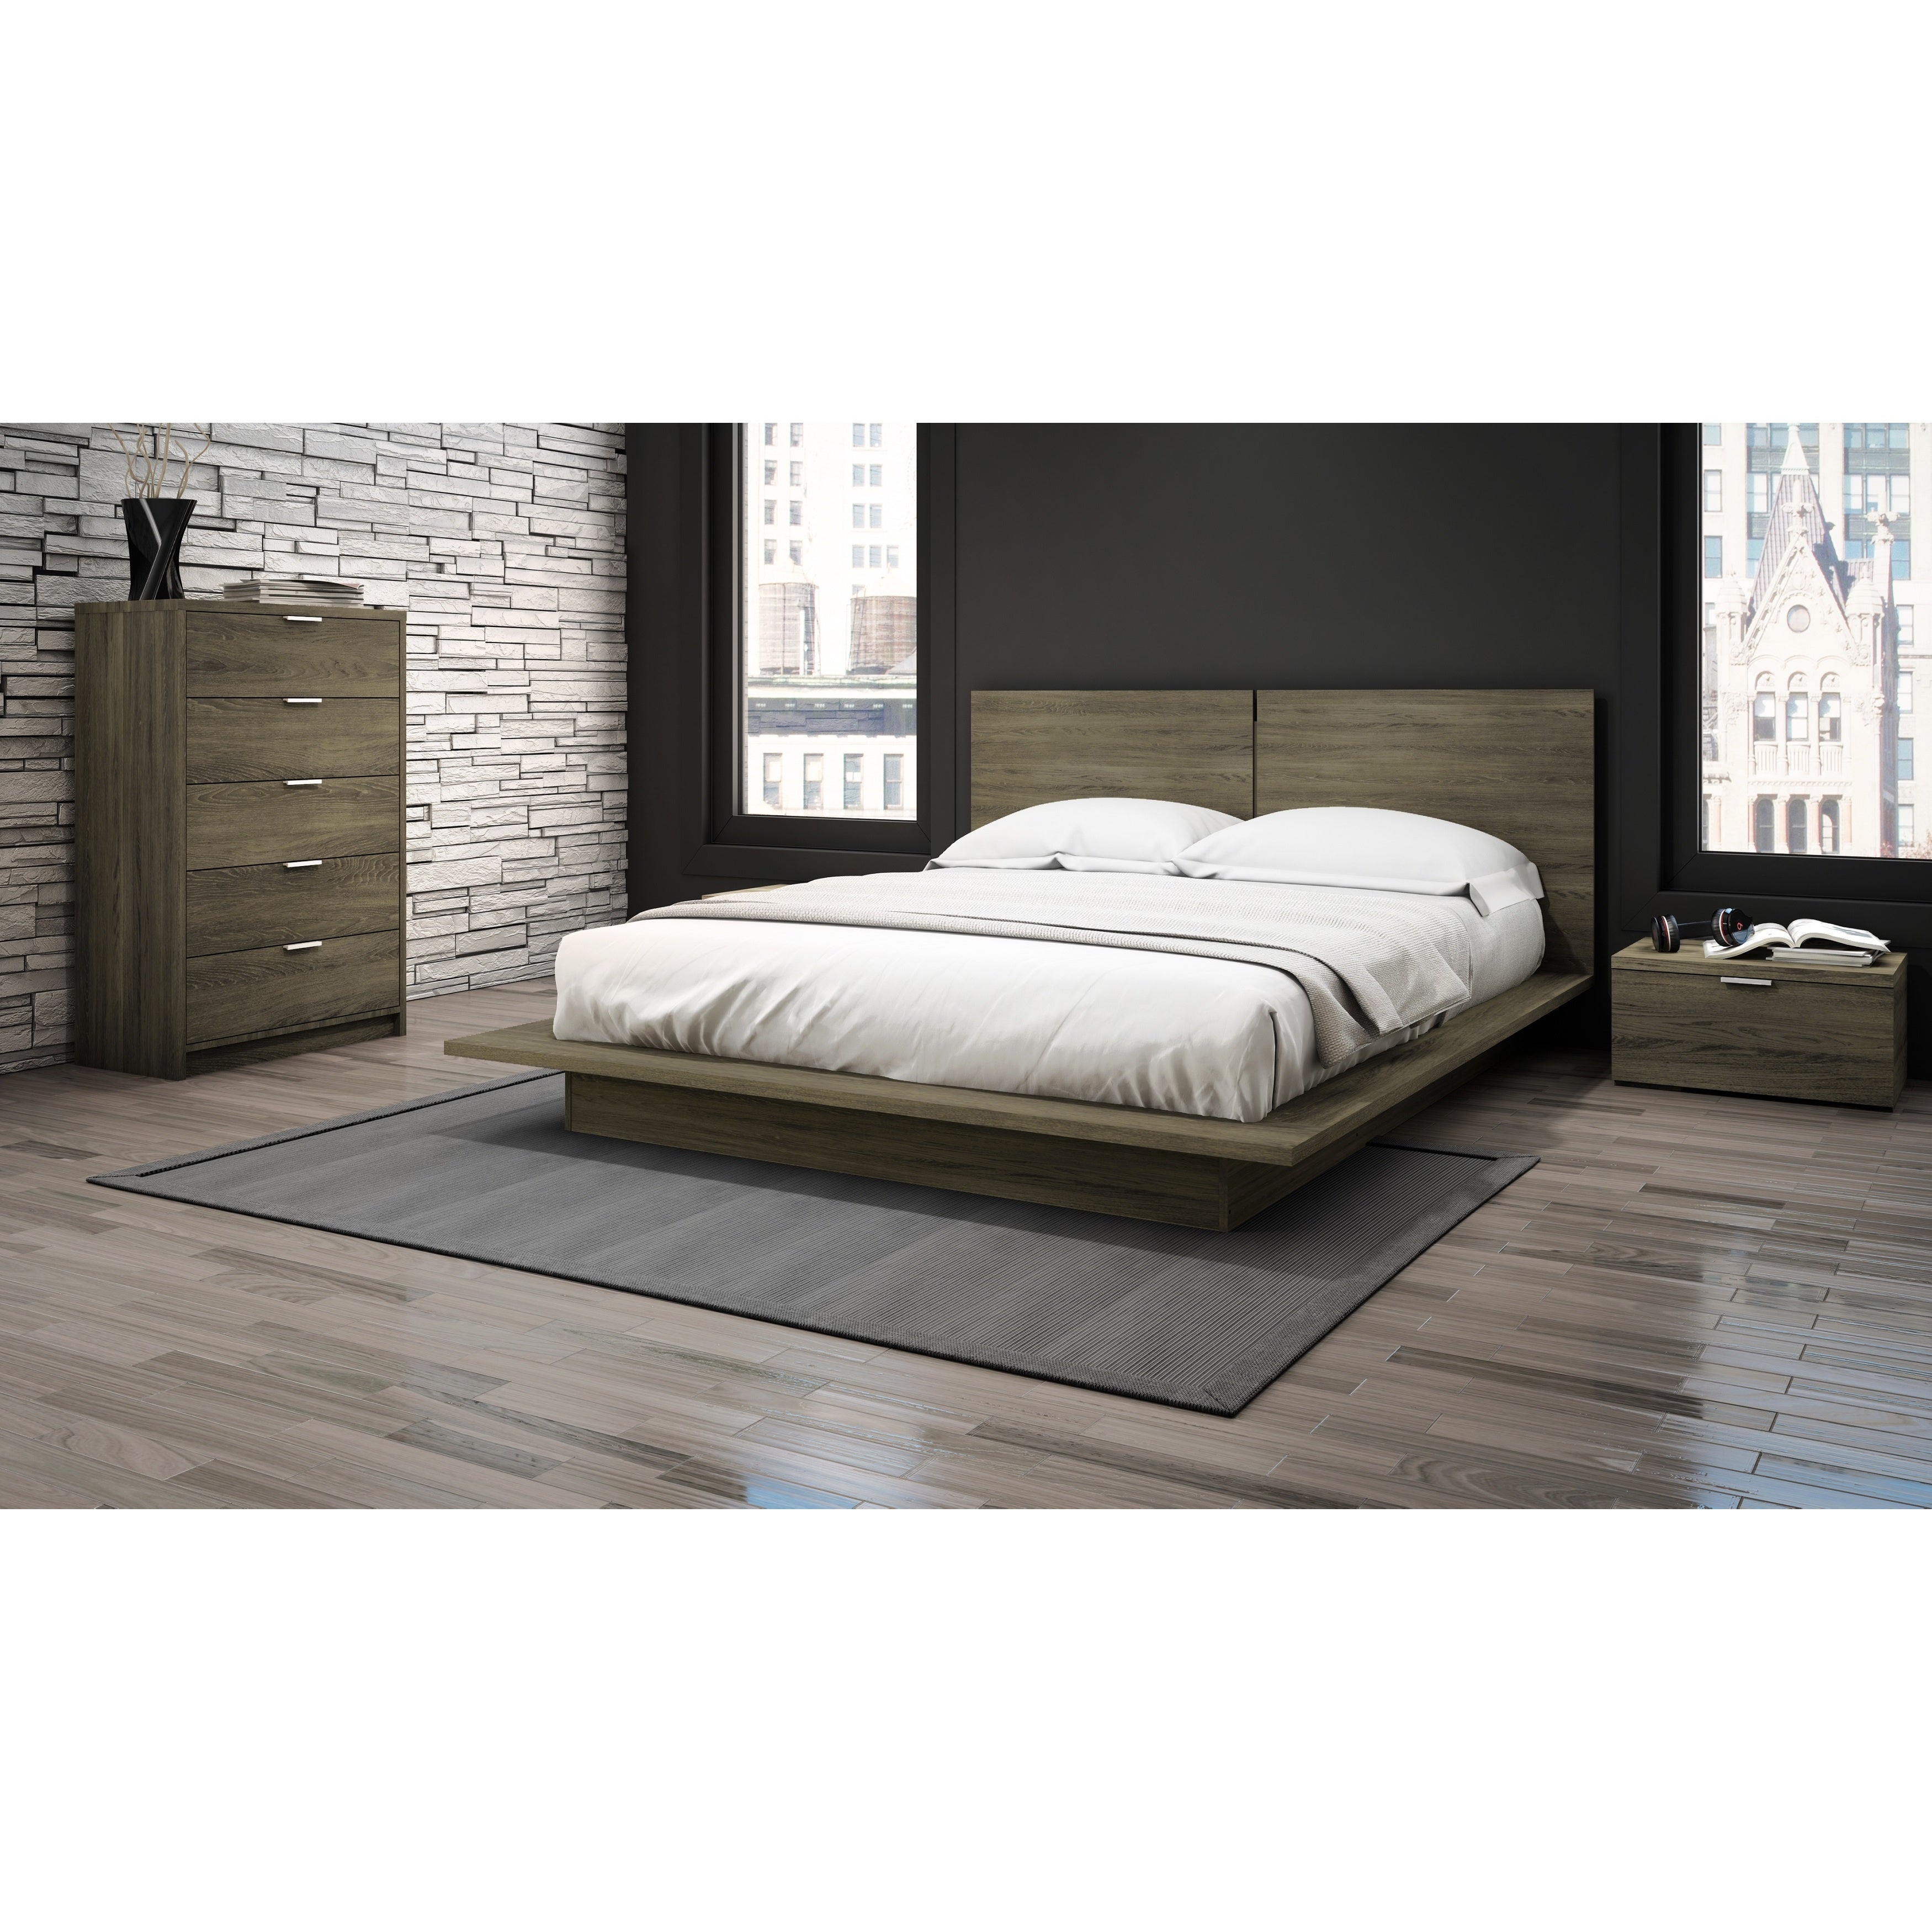 Stellar Home Furniture Low Profile Nightstand